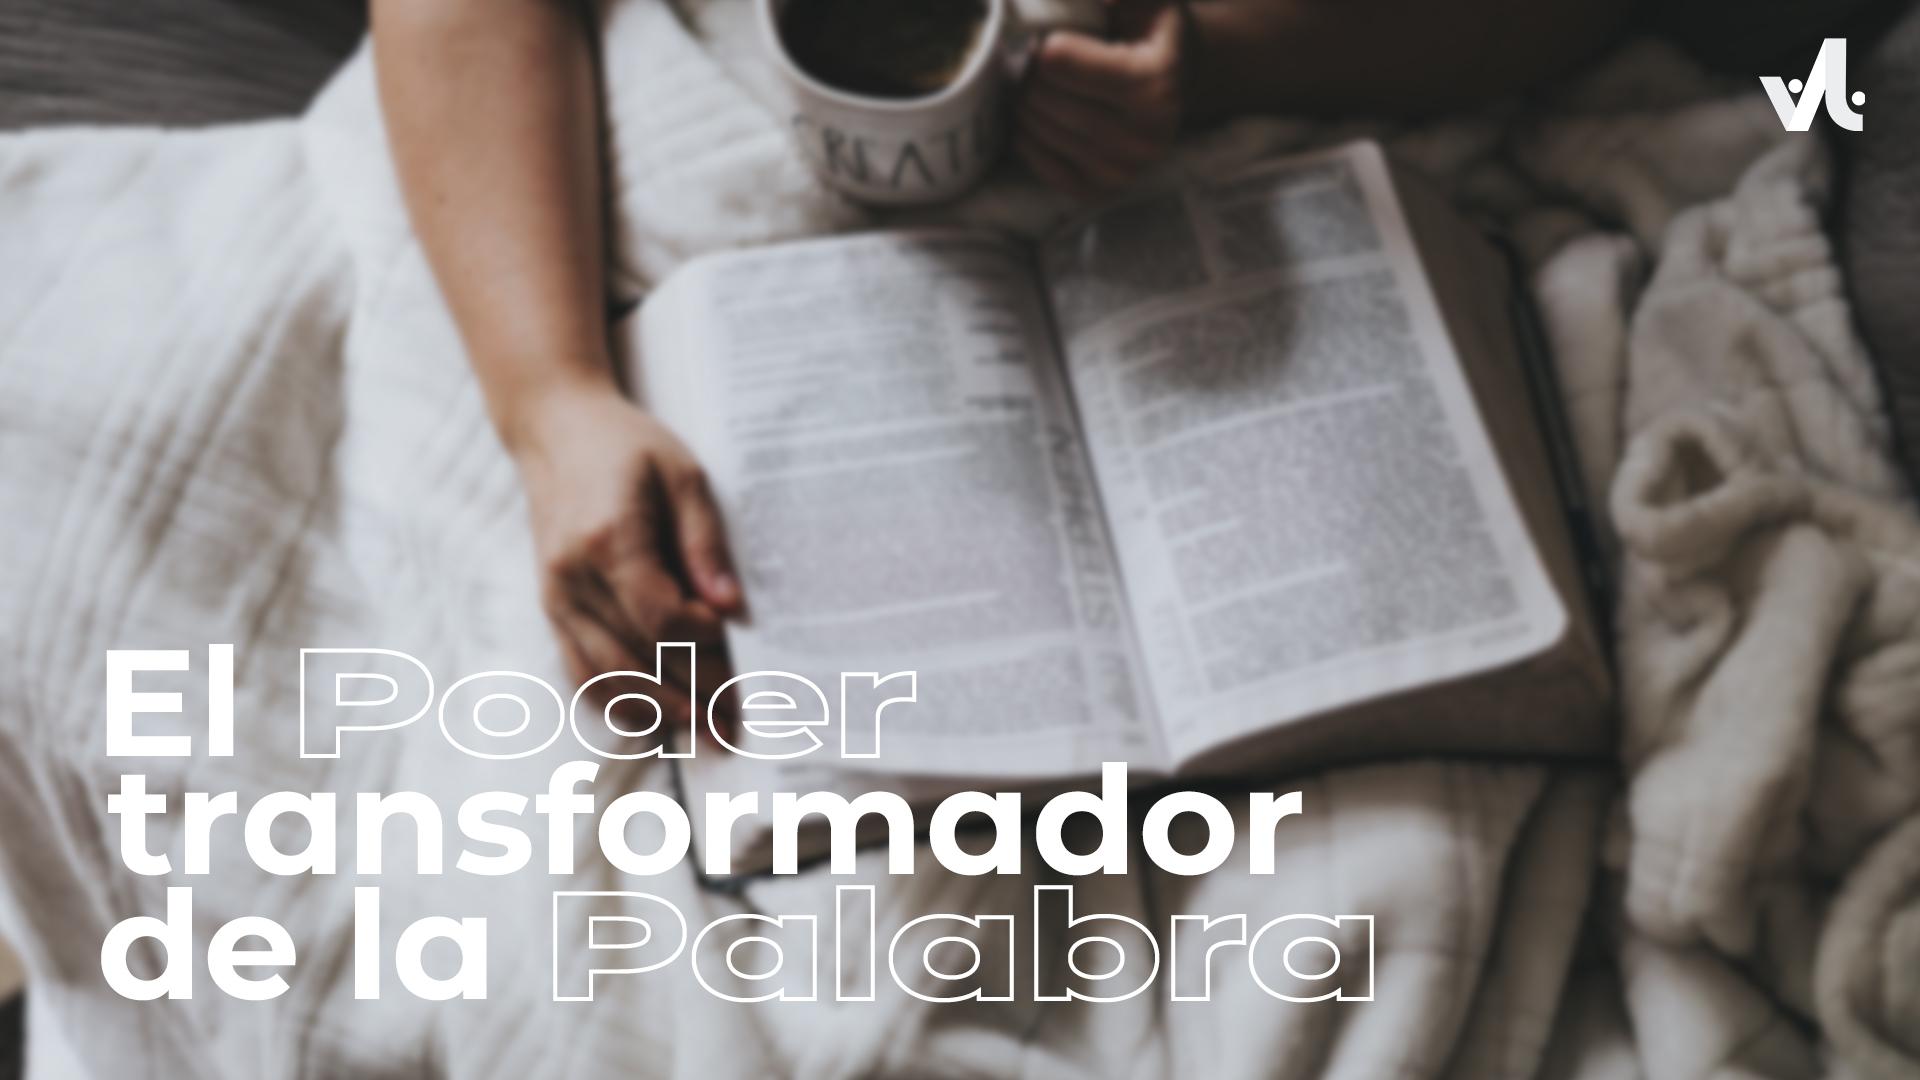 El Poder Transformador de la Palabra